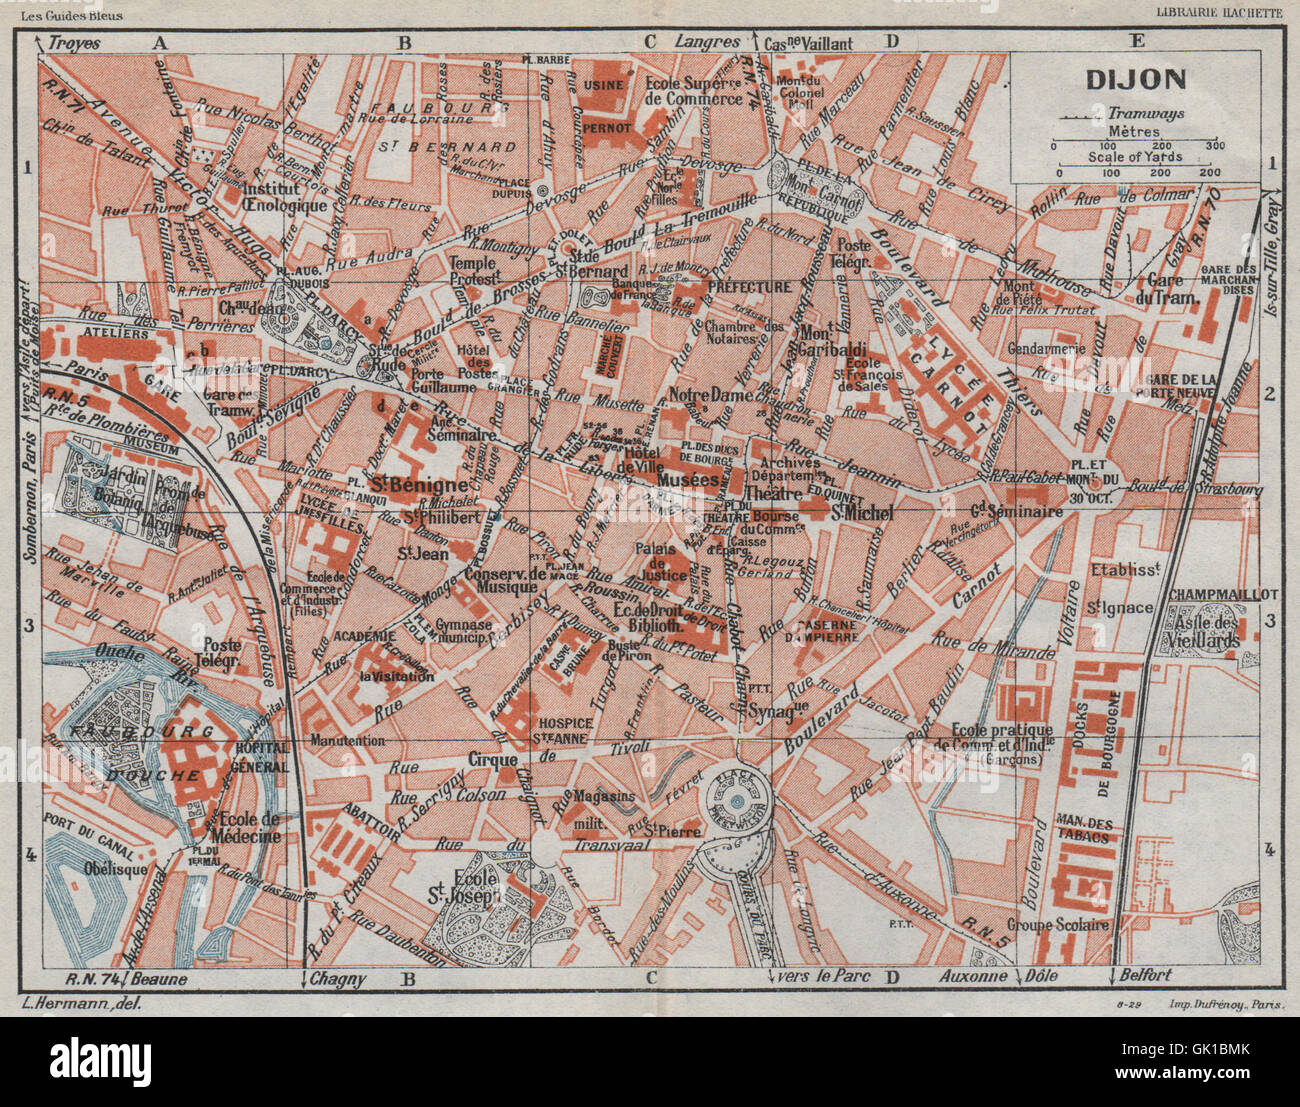 DIJON Vintage town city ville map plan carte CtedOr 1930 Stock